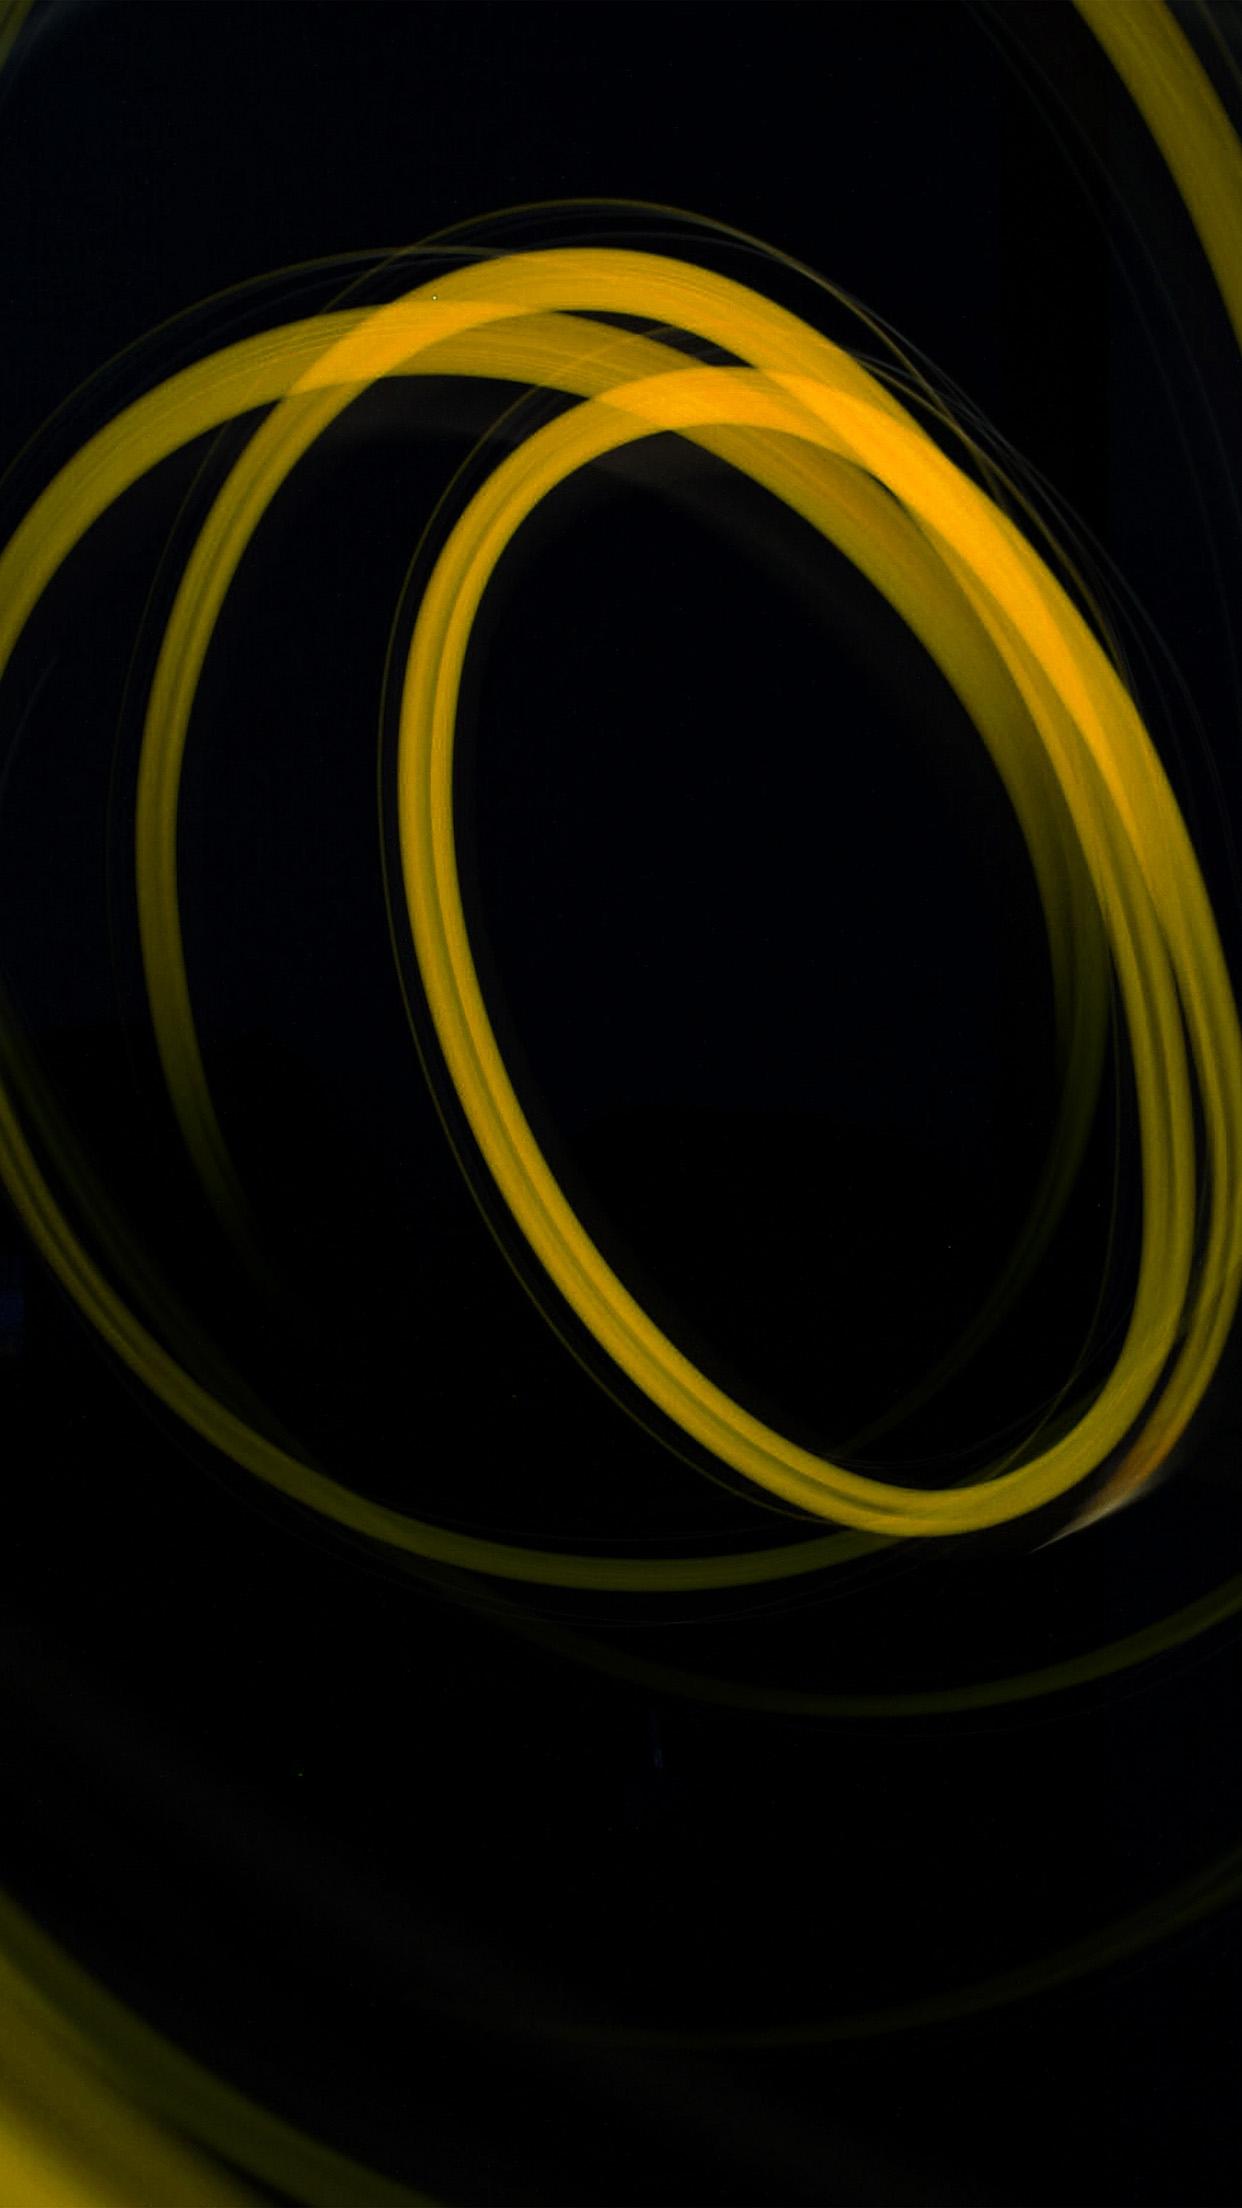 Iphone 7 Plus Dark Yellow Wallpaper Iphone X 2101776